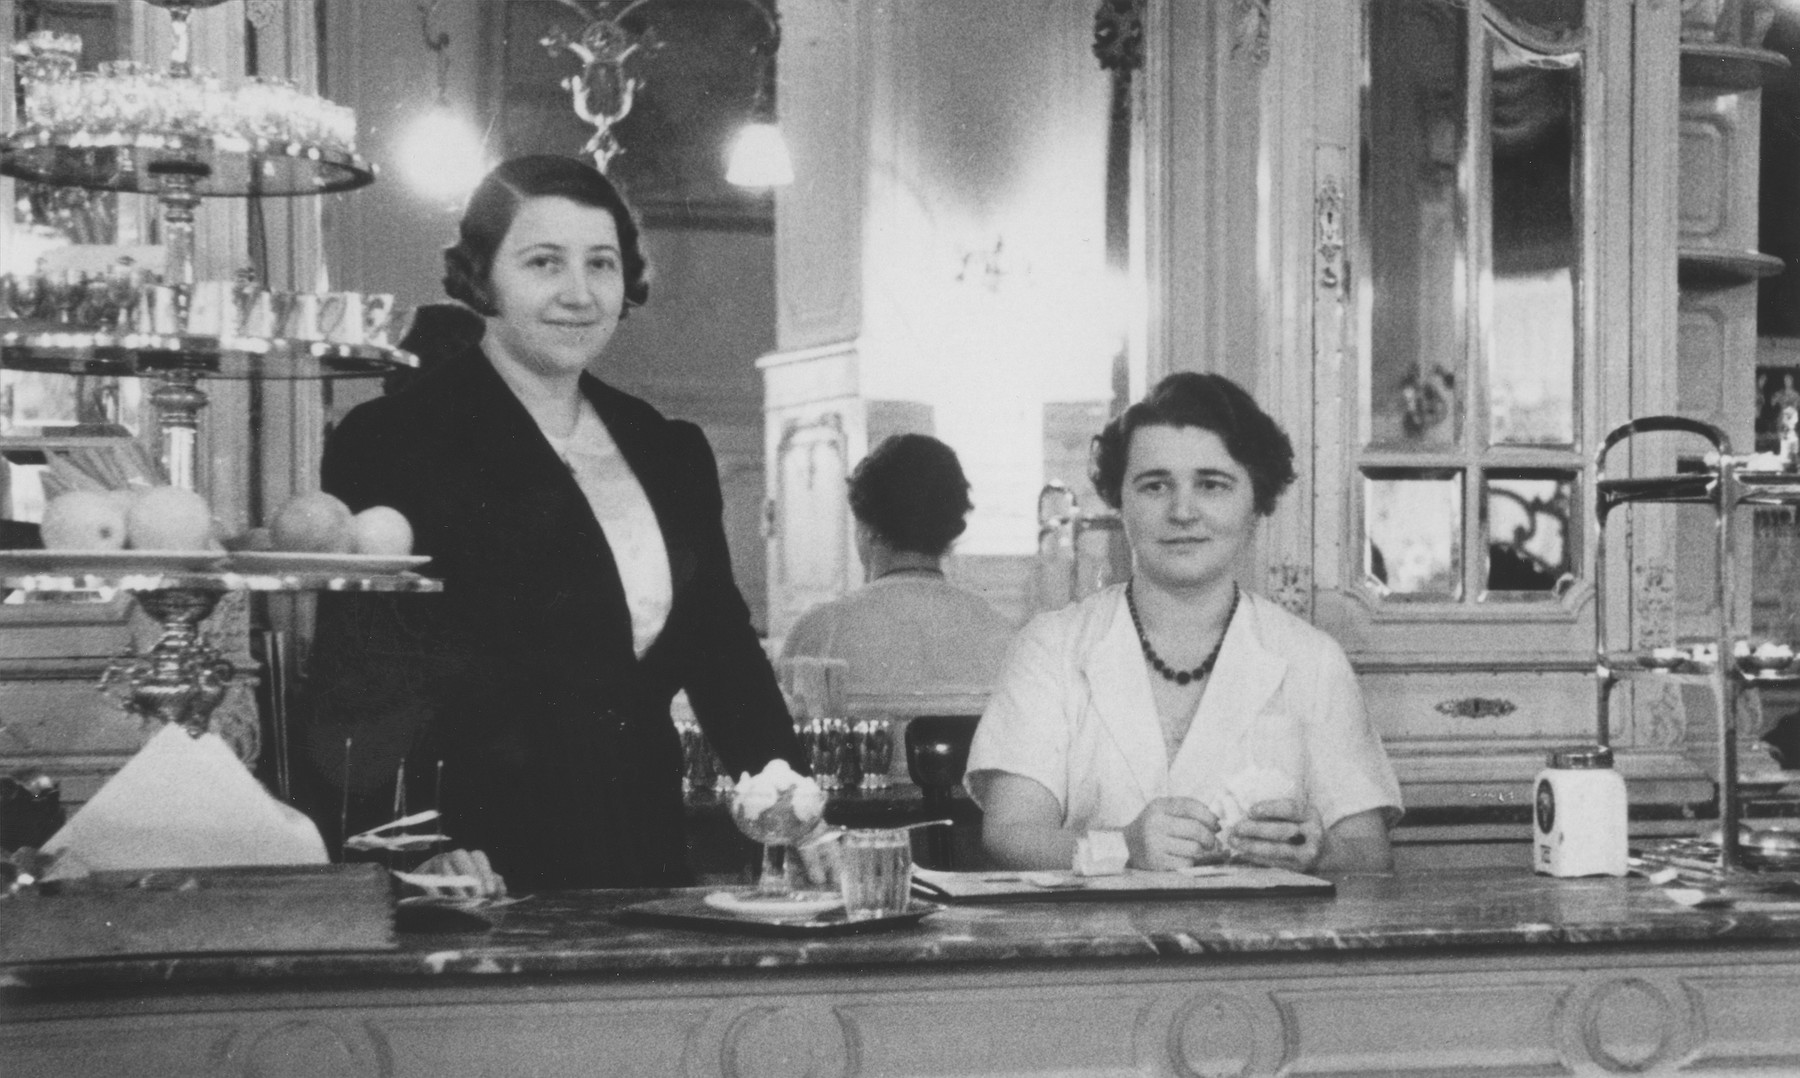 Jewish restauranteur Greta Mayer (left) stands behind the counter at her coffee house in Vienna.